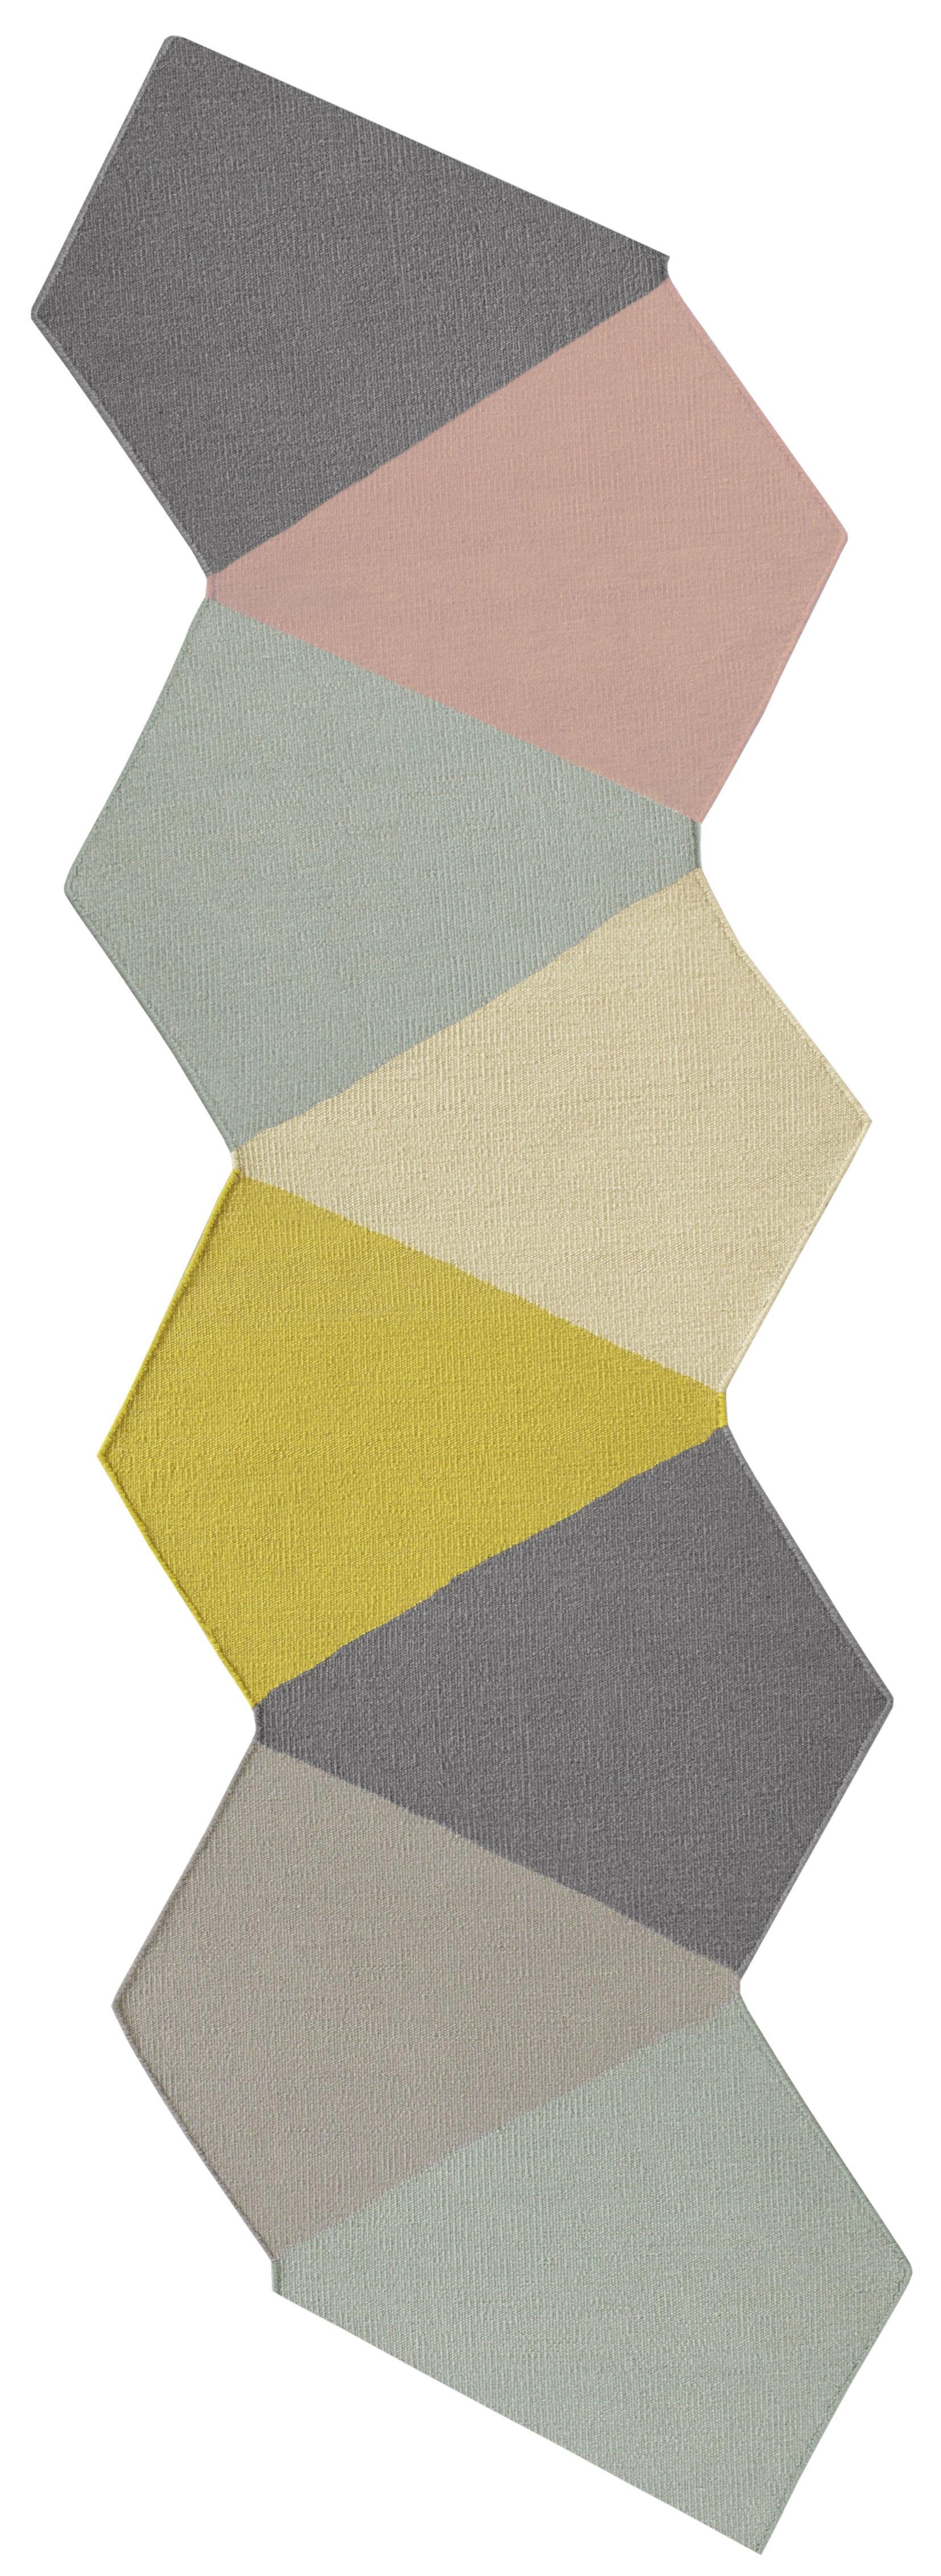 crux teppich 395 x 130 cm exklusives online angebot mehrfarbig by kinnasand made in design. Black Bedroom Furniture Sets. Home Design Ideas